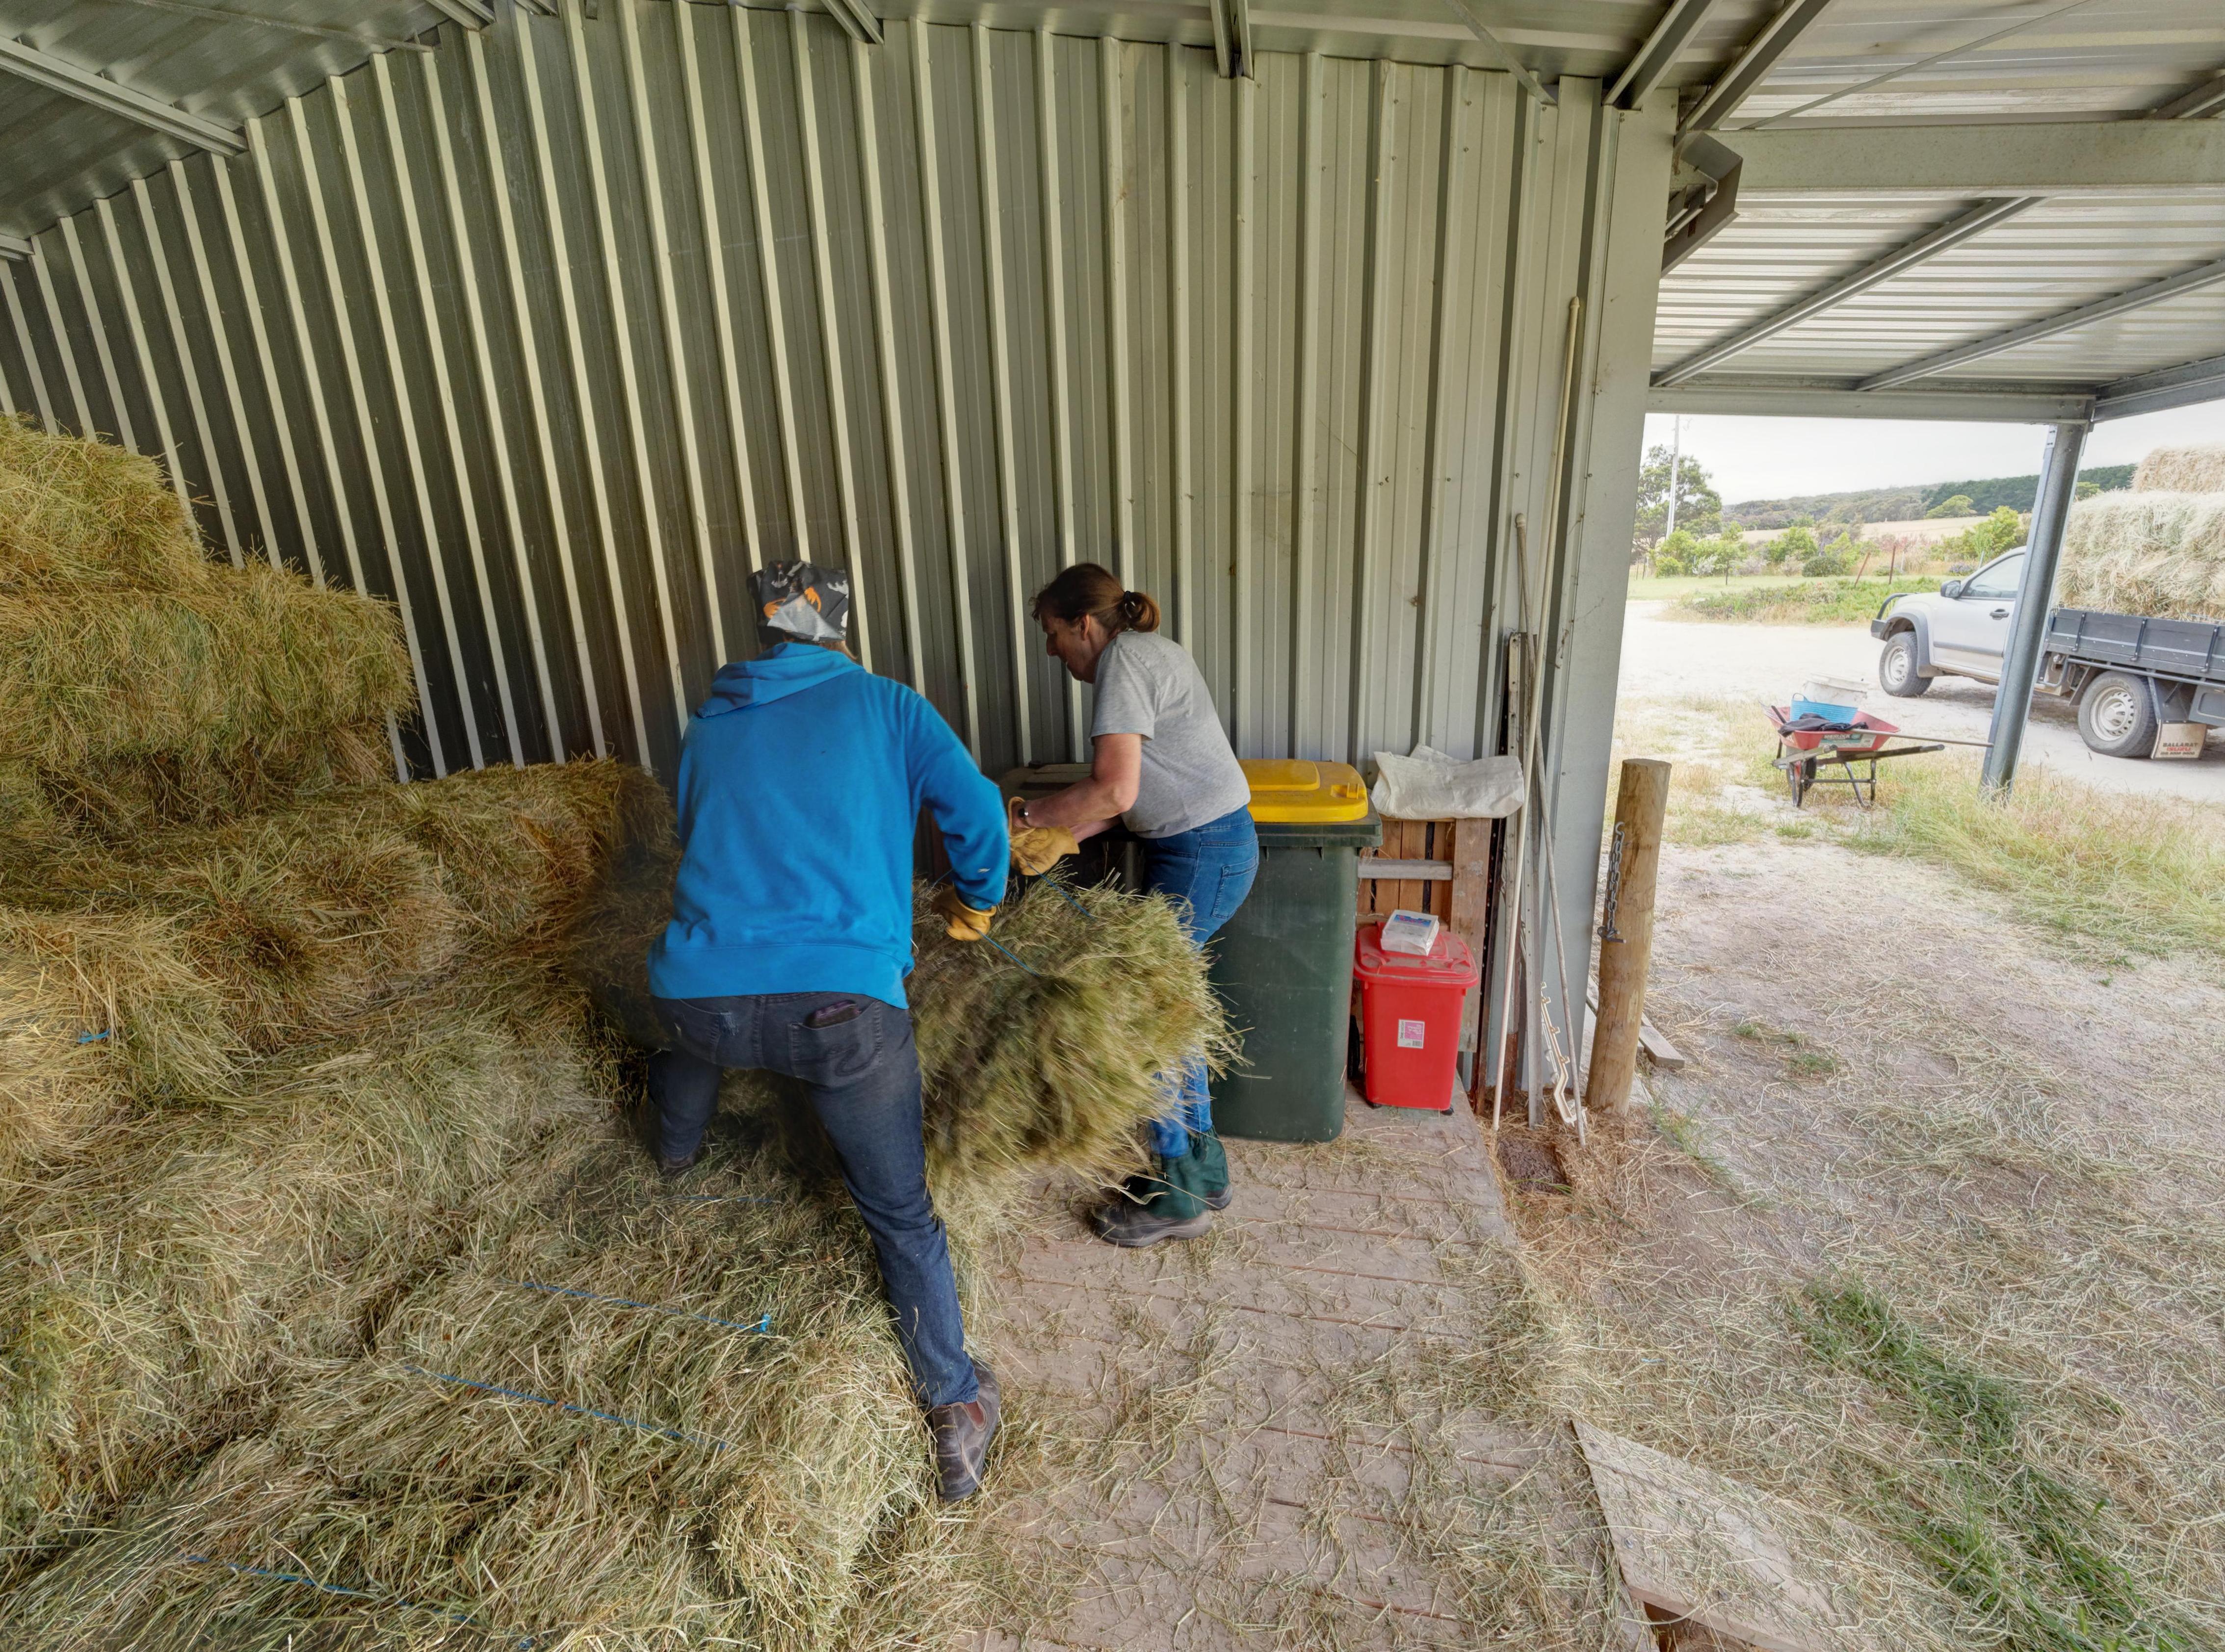 Unloading-hay-a-7.jpeg